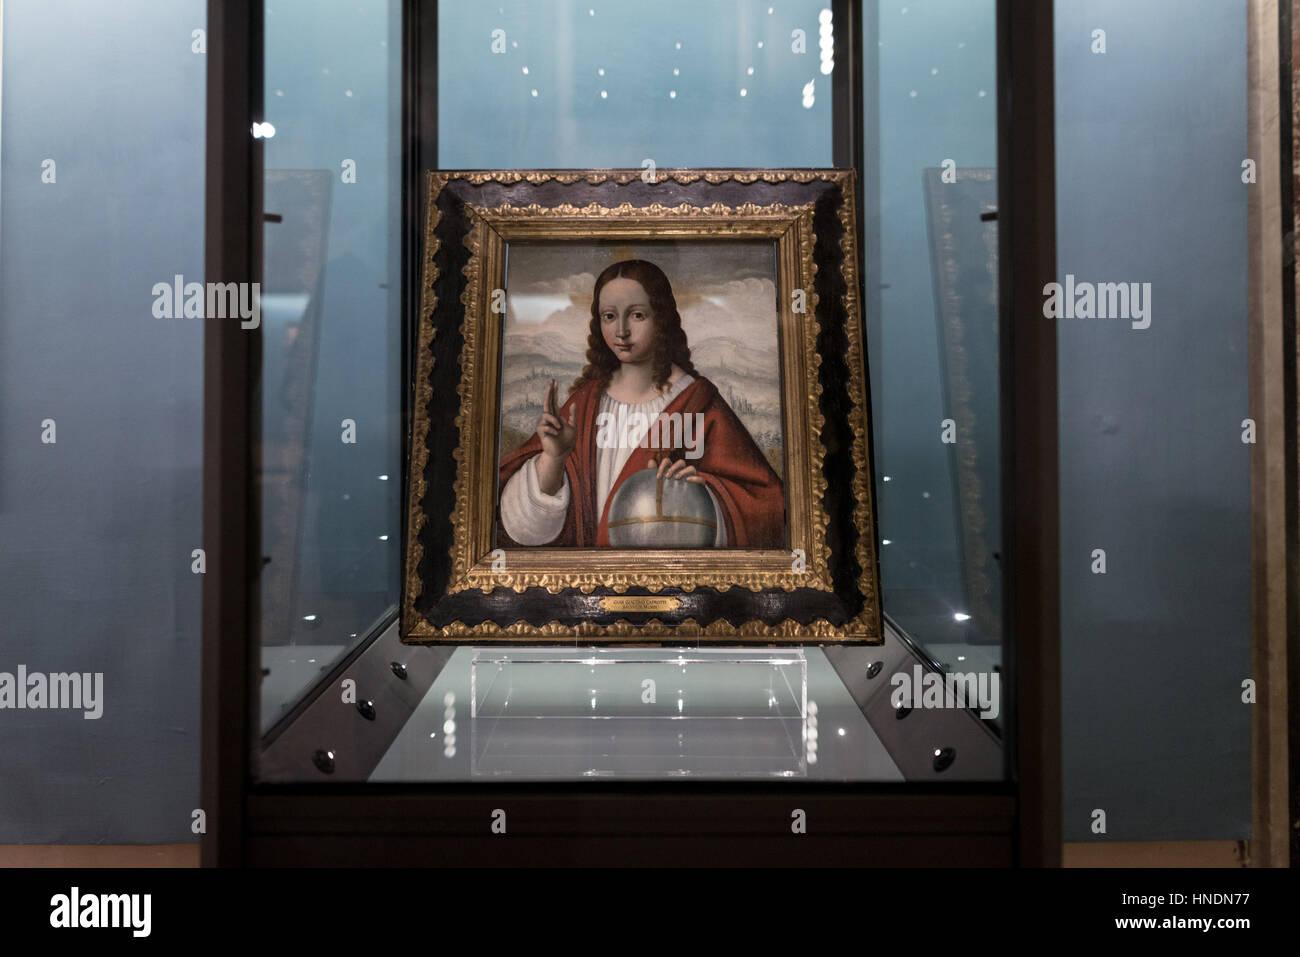 The controversial masterpiece by Leonardo Da Vinci 'Salvator